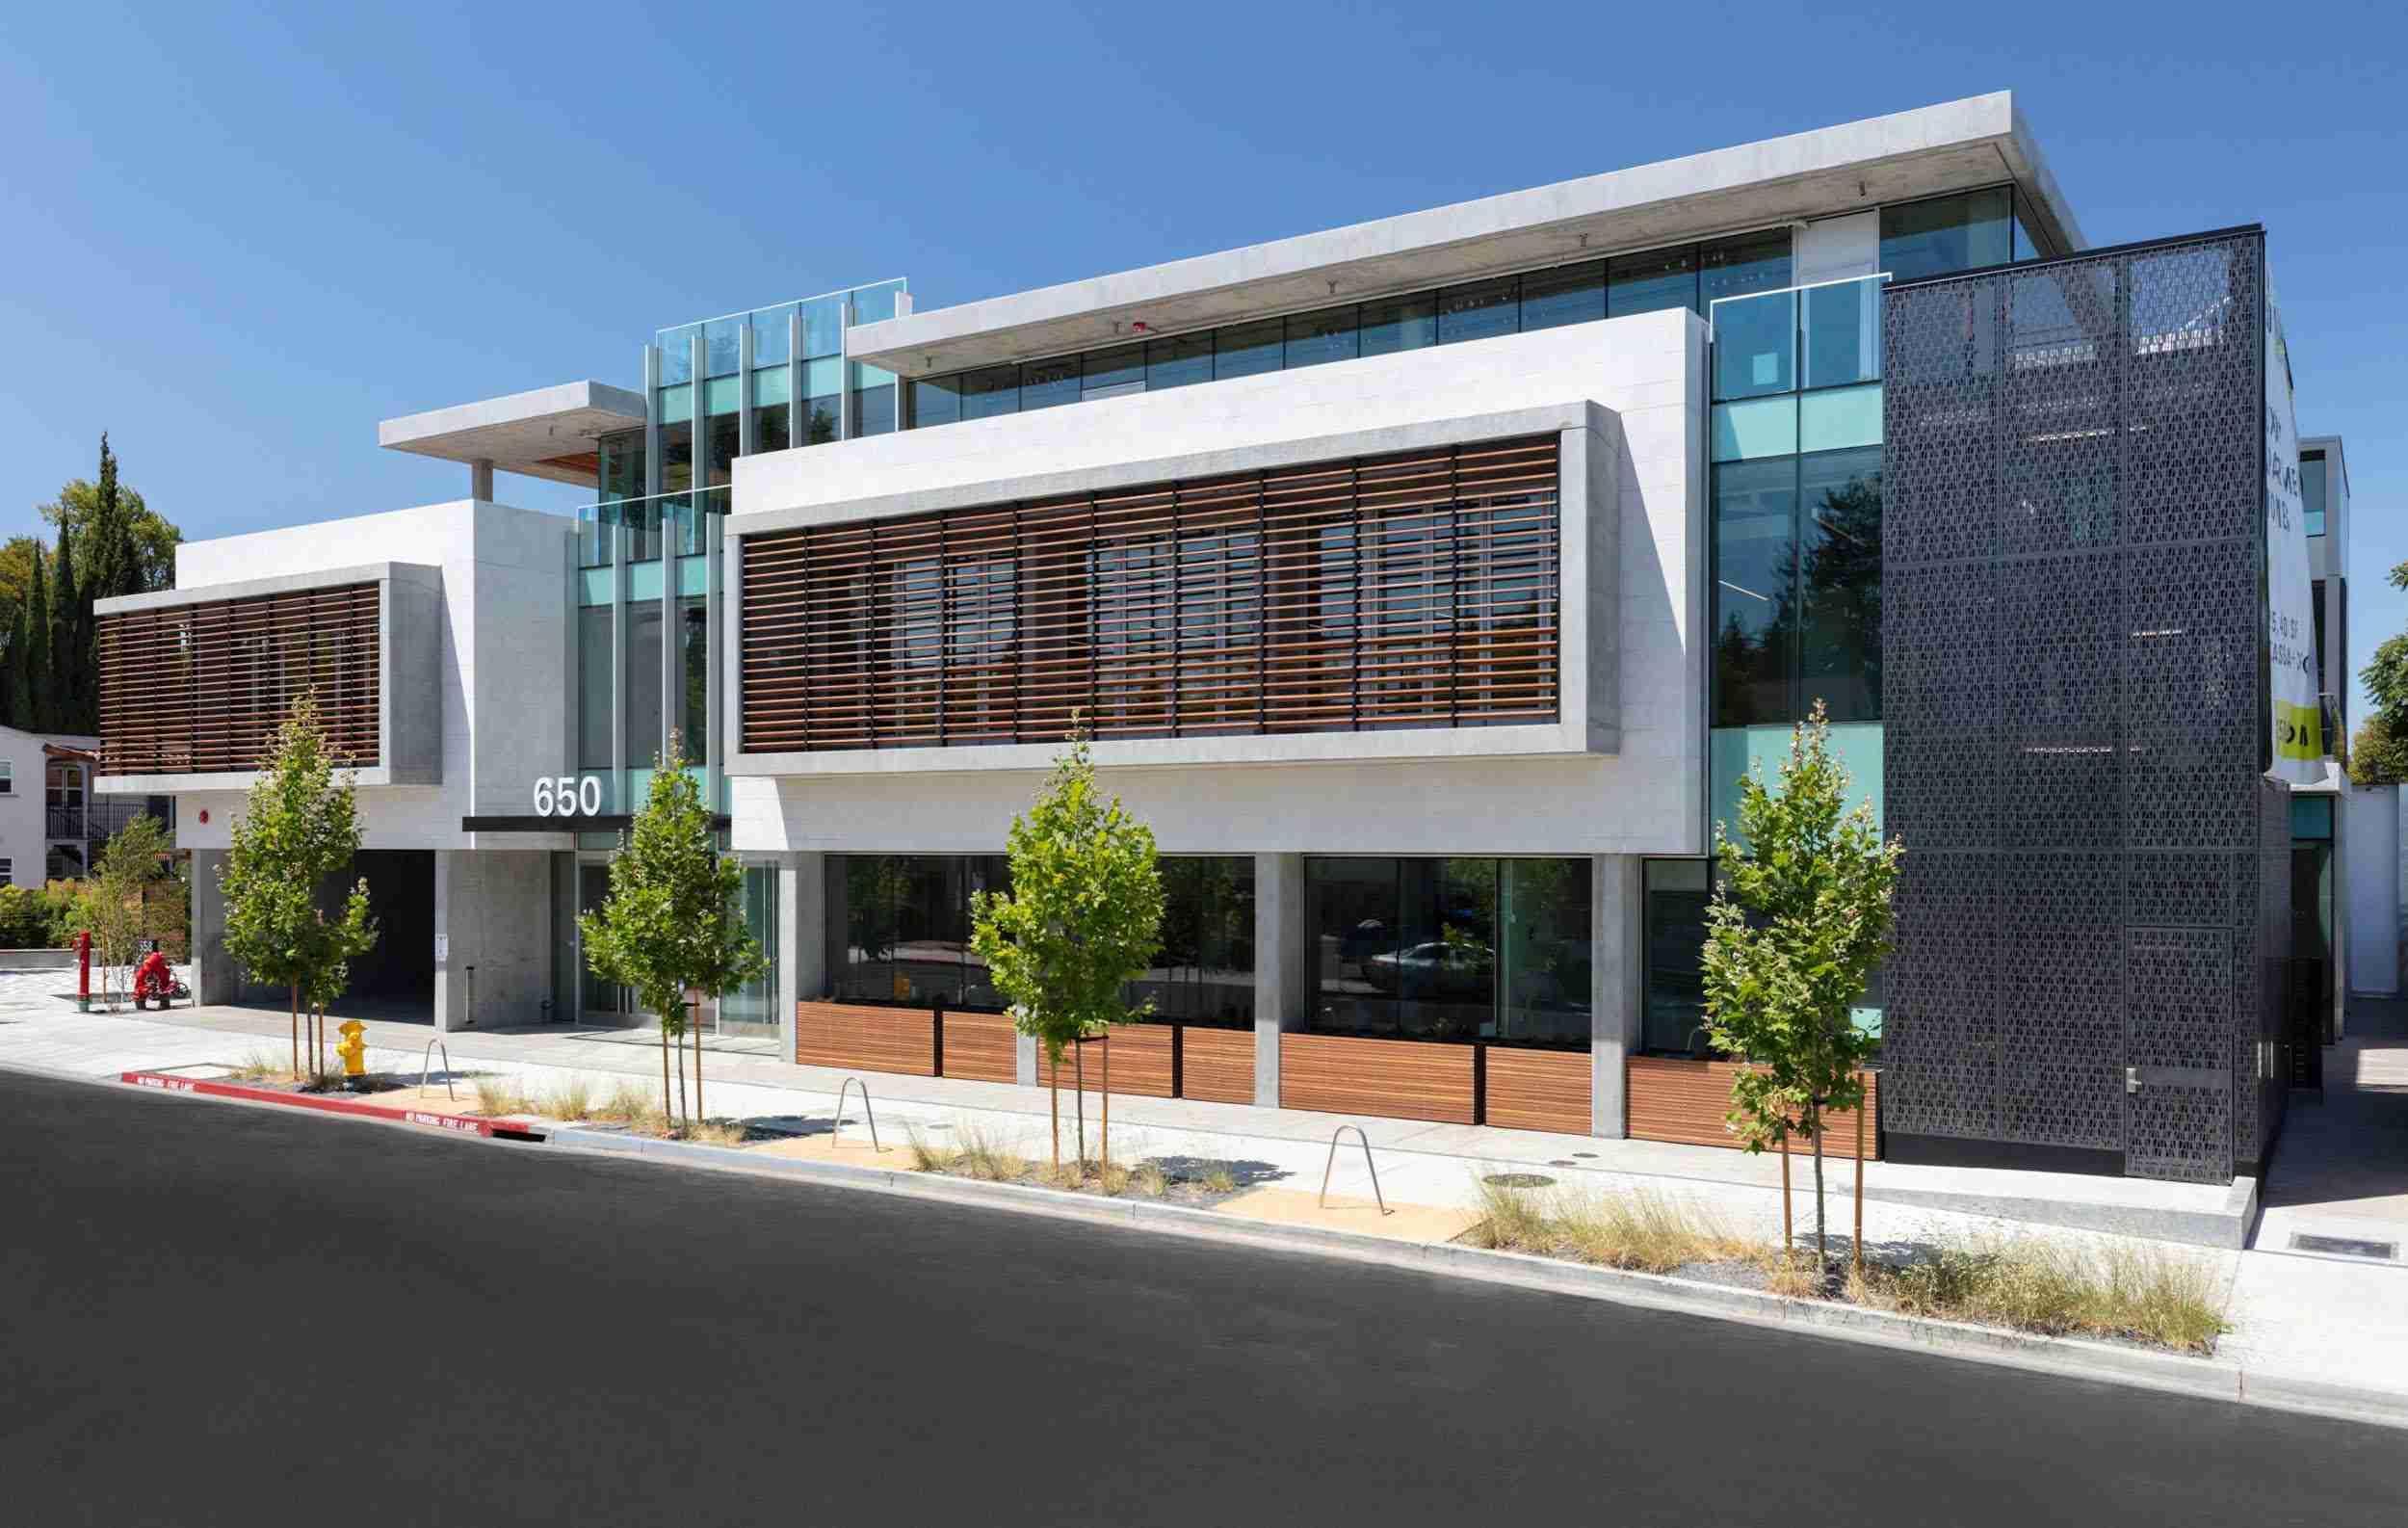 Residential Entrance 650 Live Oak Menlo Park mixed-use architecture project ©brick-inc